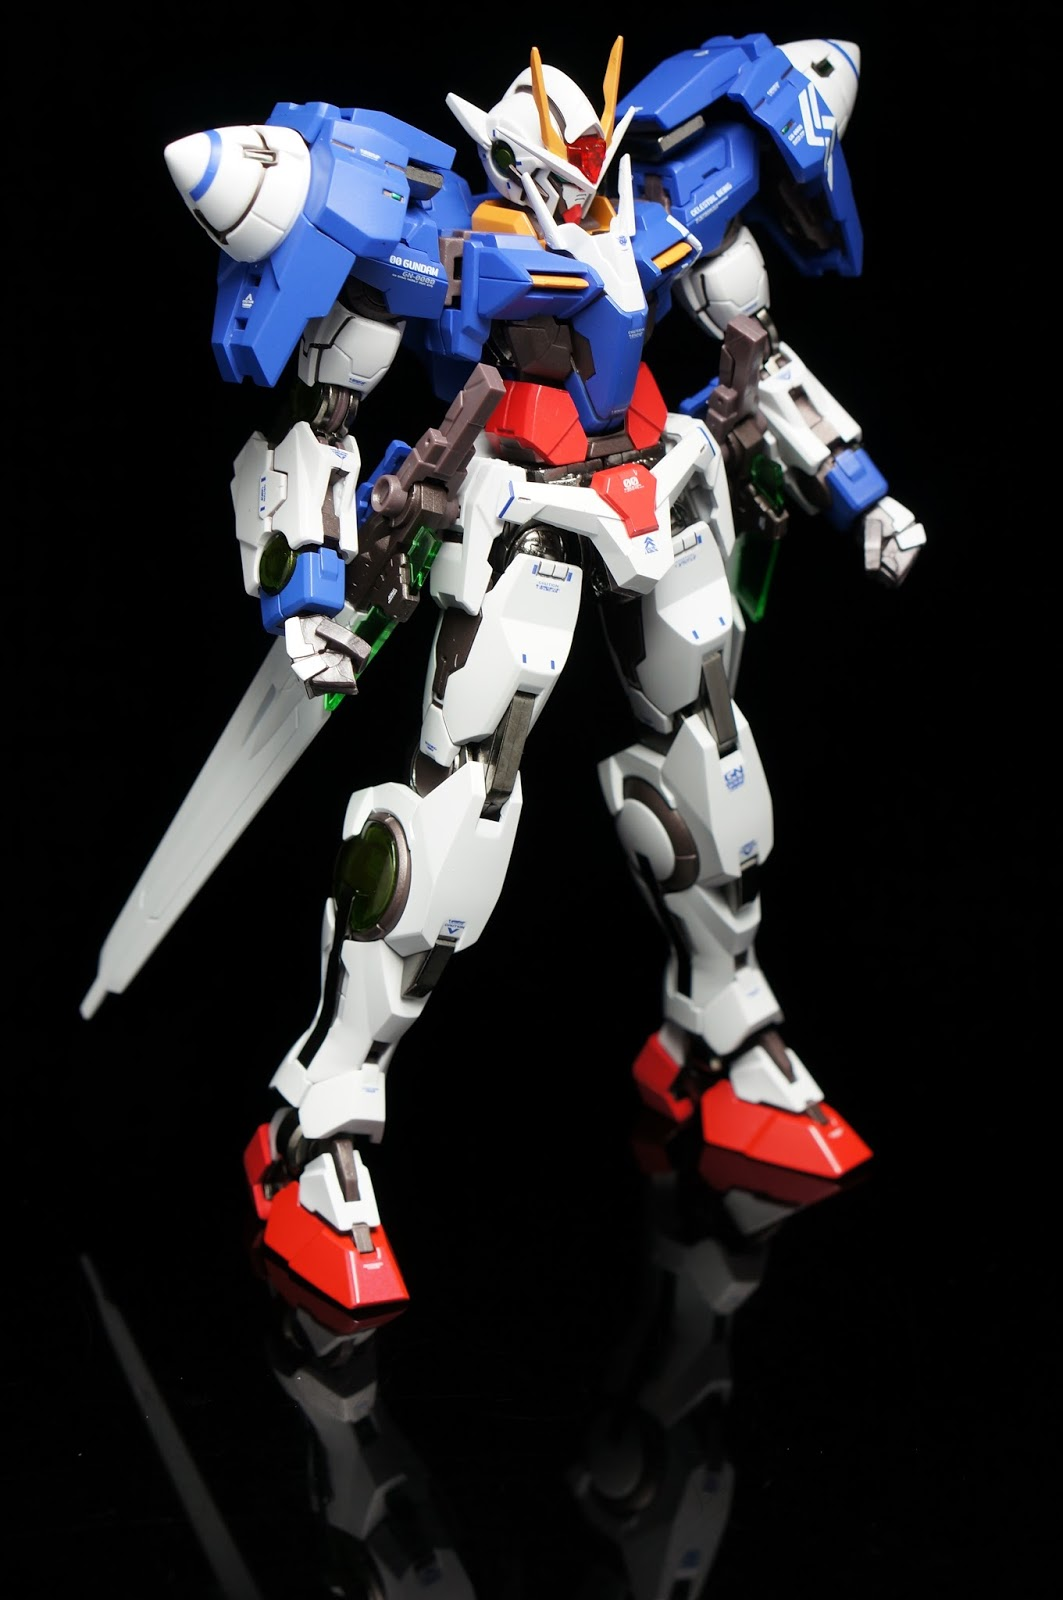 Gary Charm 魔術師的玩具 Blog : Gundam 00 @ Metal Build